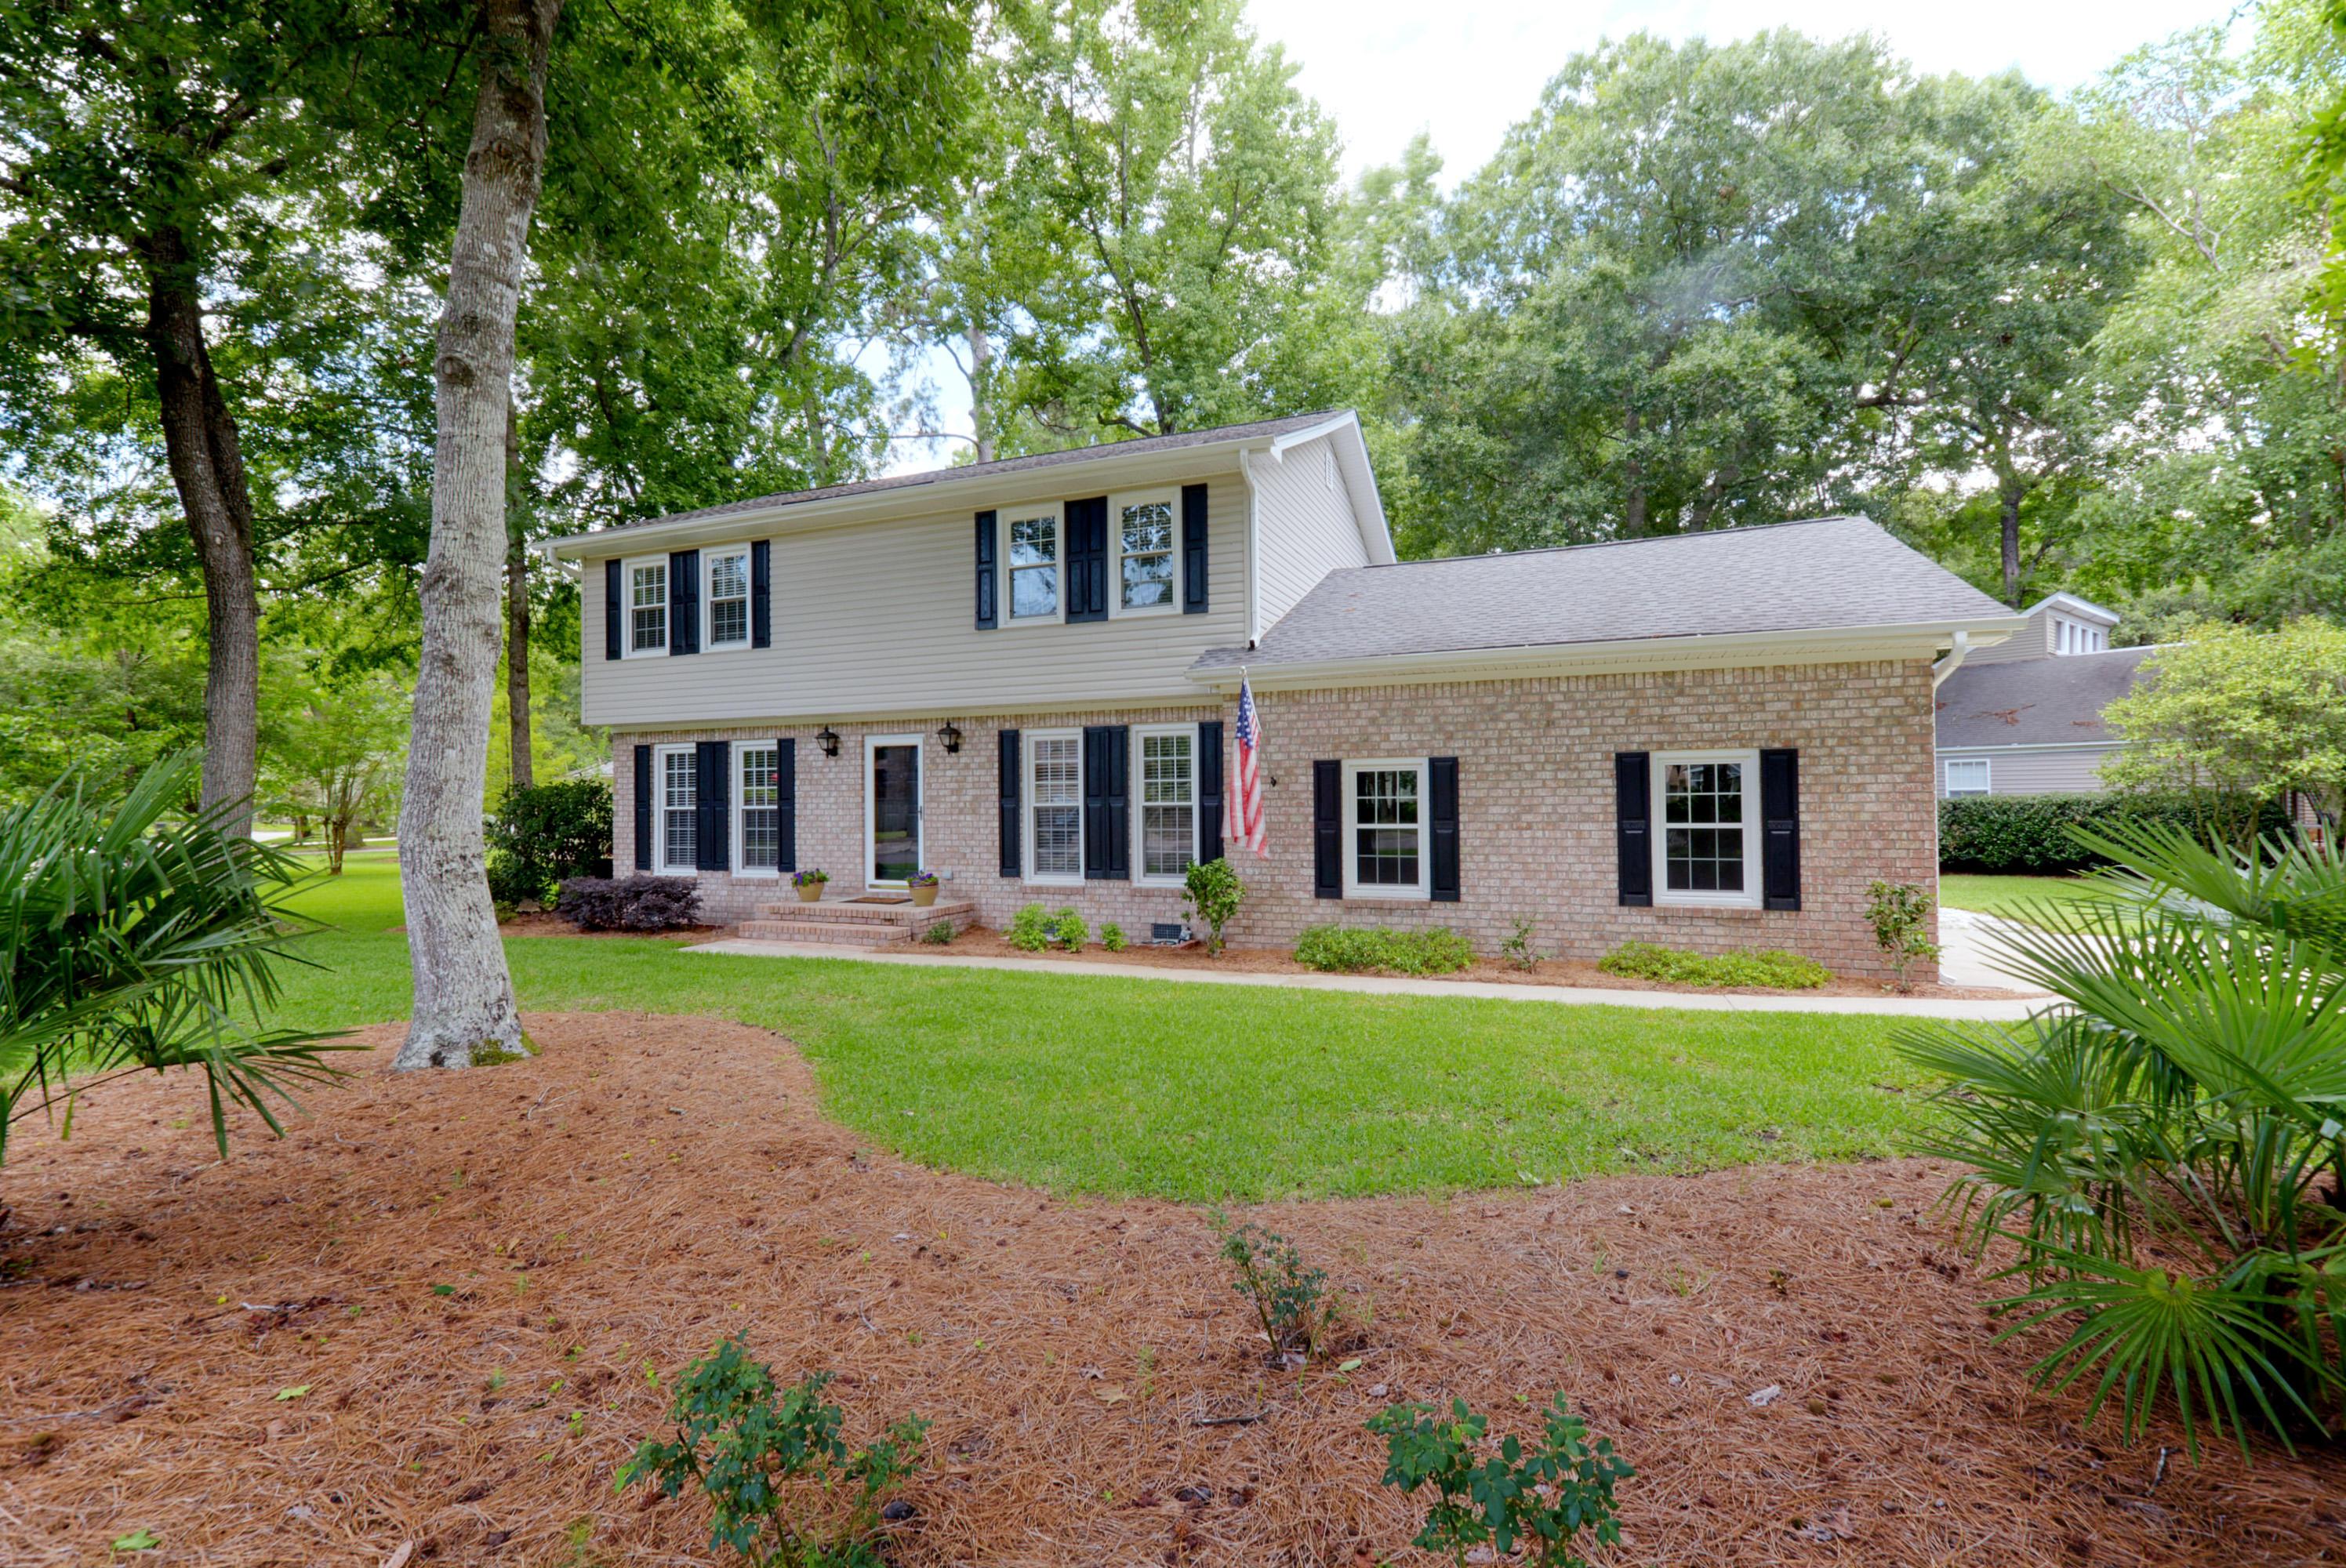 Snee Farm Homes For Sale - 1048 Royalist Rd, Mount Pleasant, SC - 4